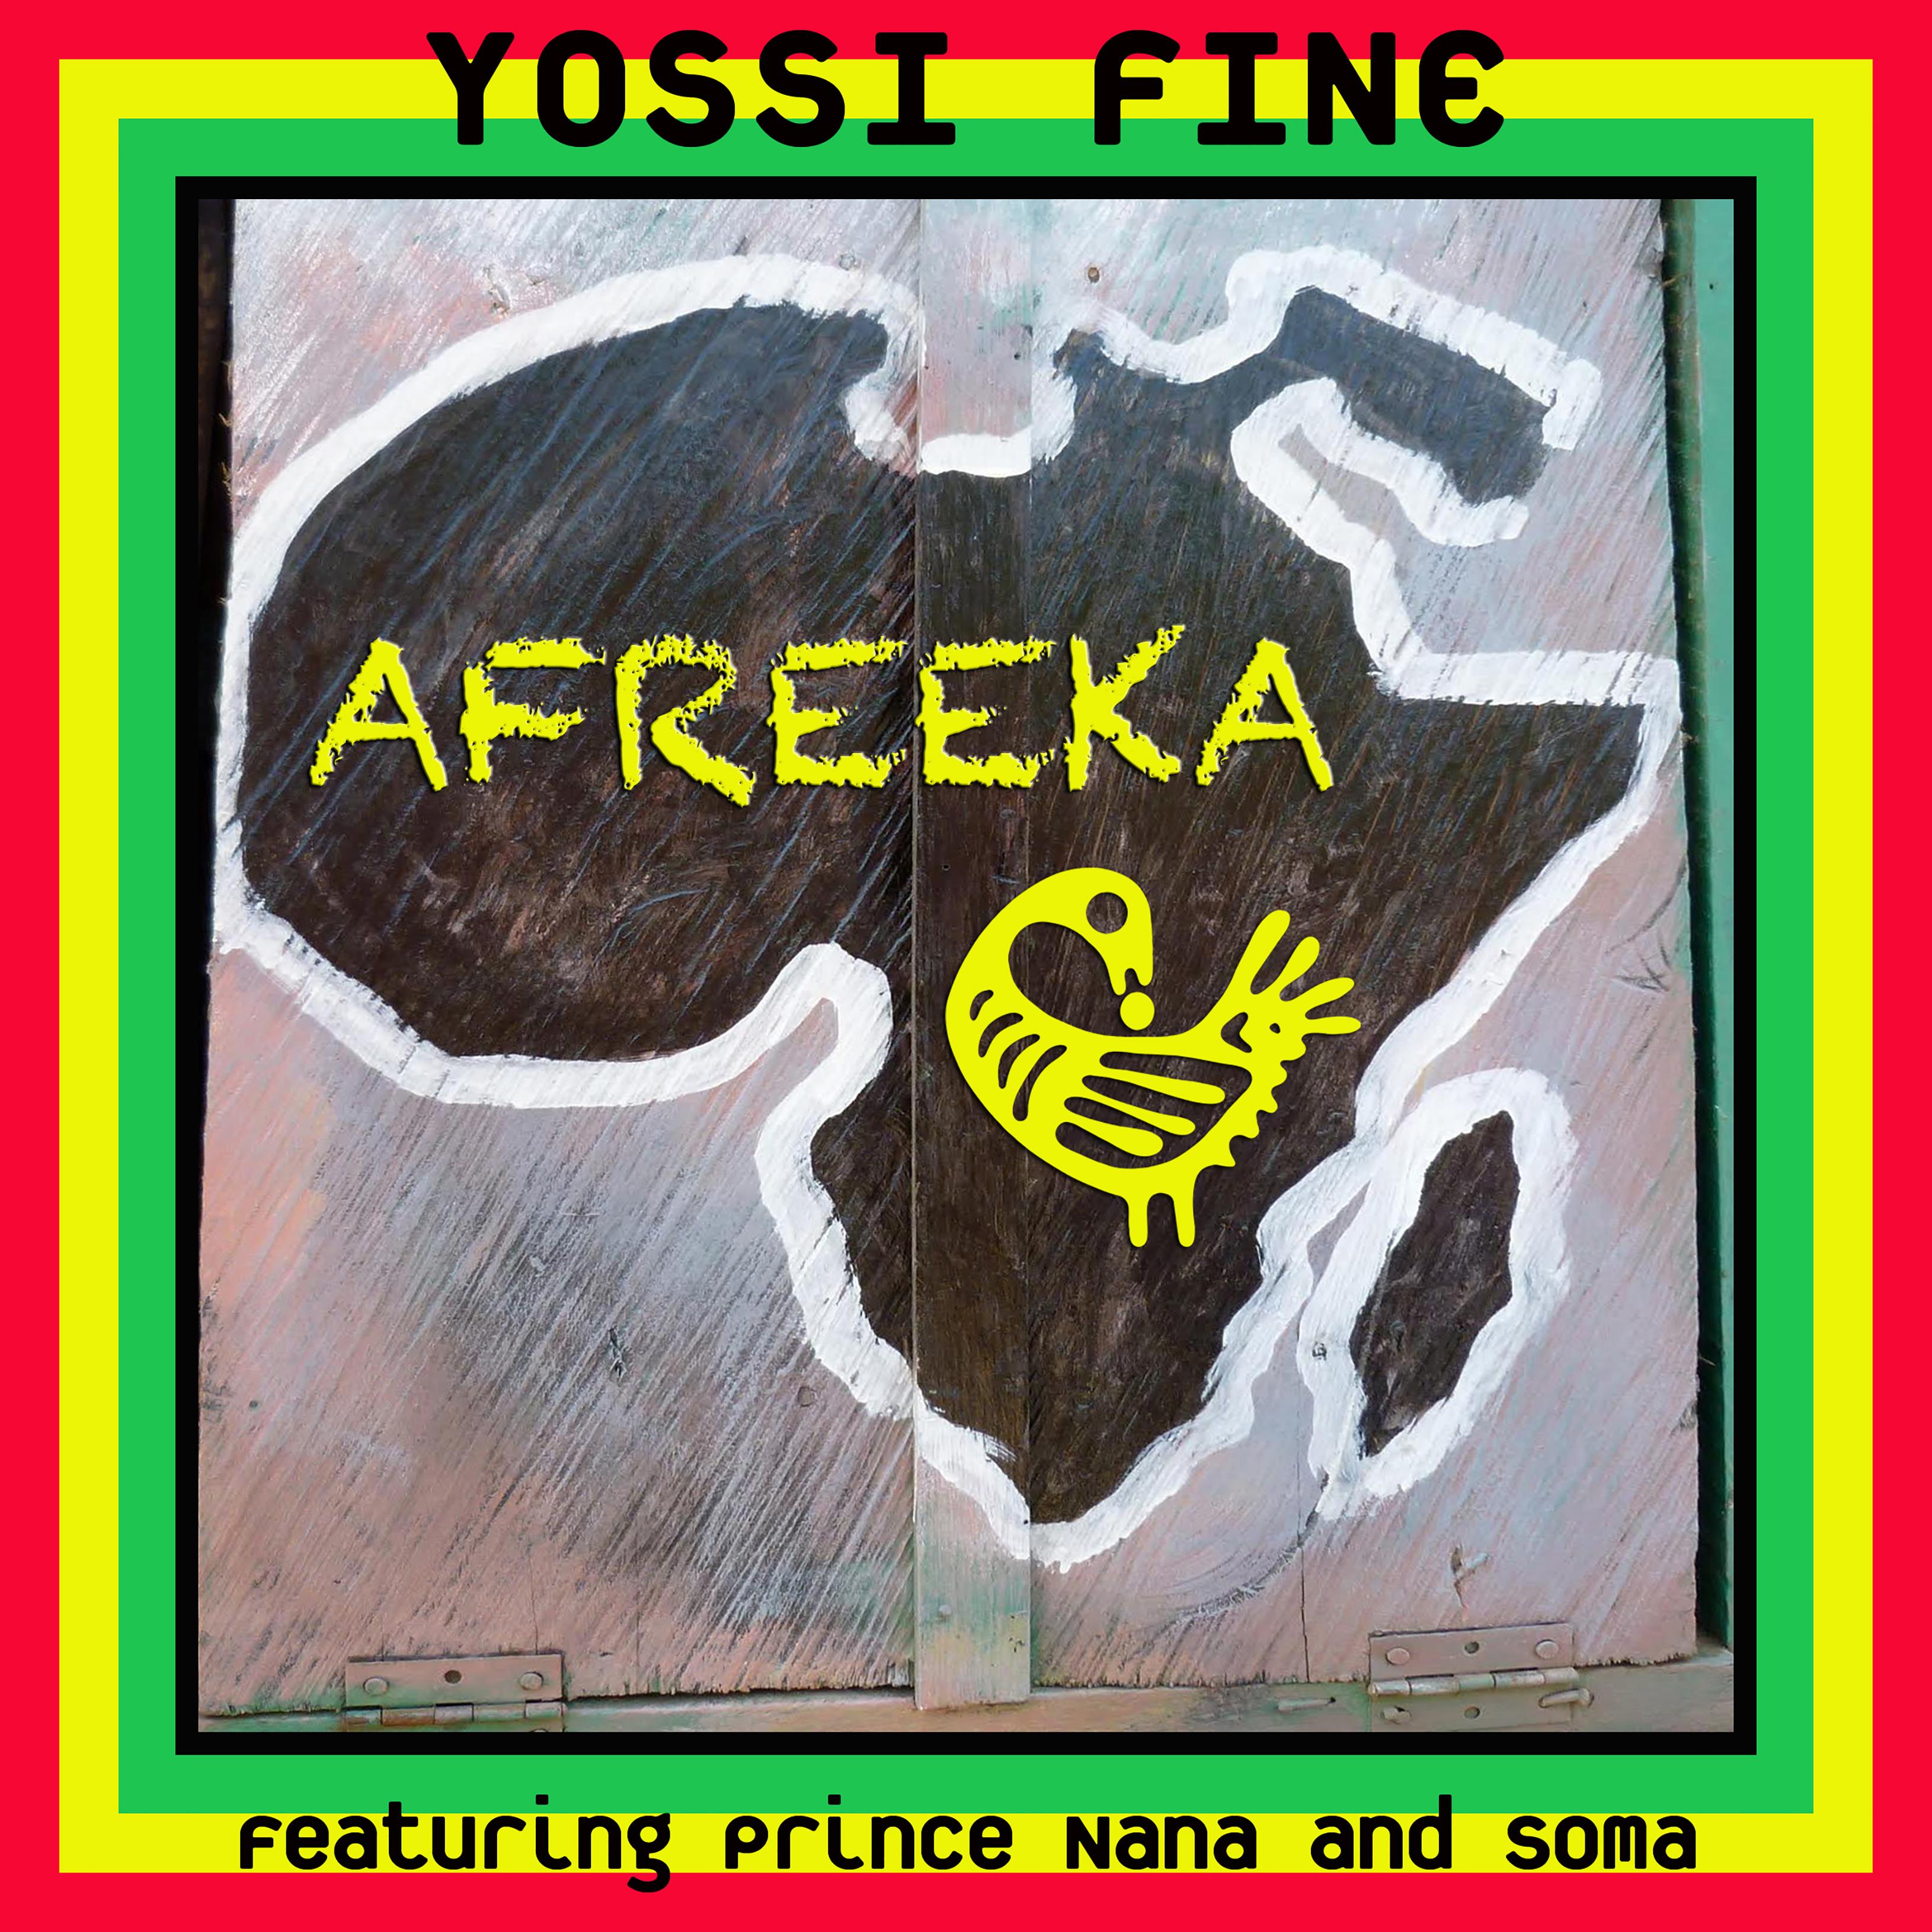 Yossi Fine featuring Prince Nana and Soma are recording a new album, Afreeka!